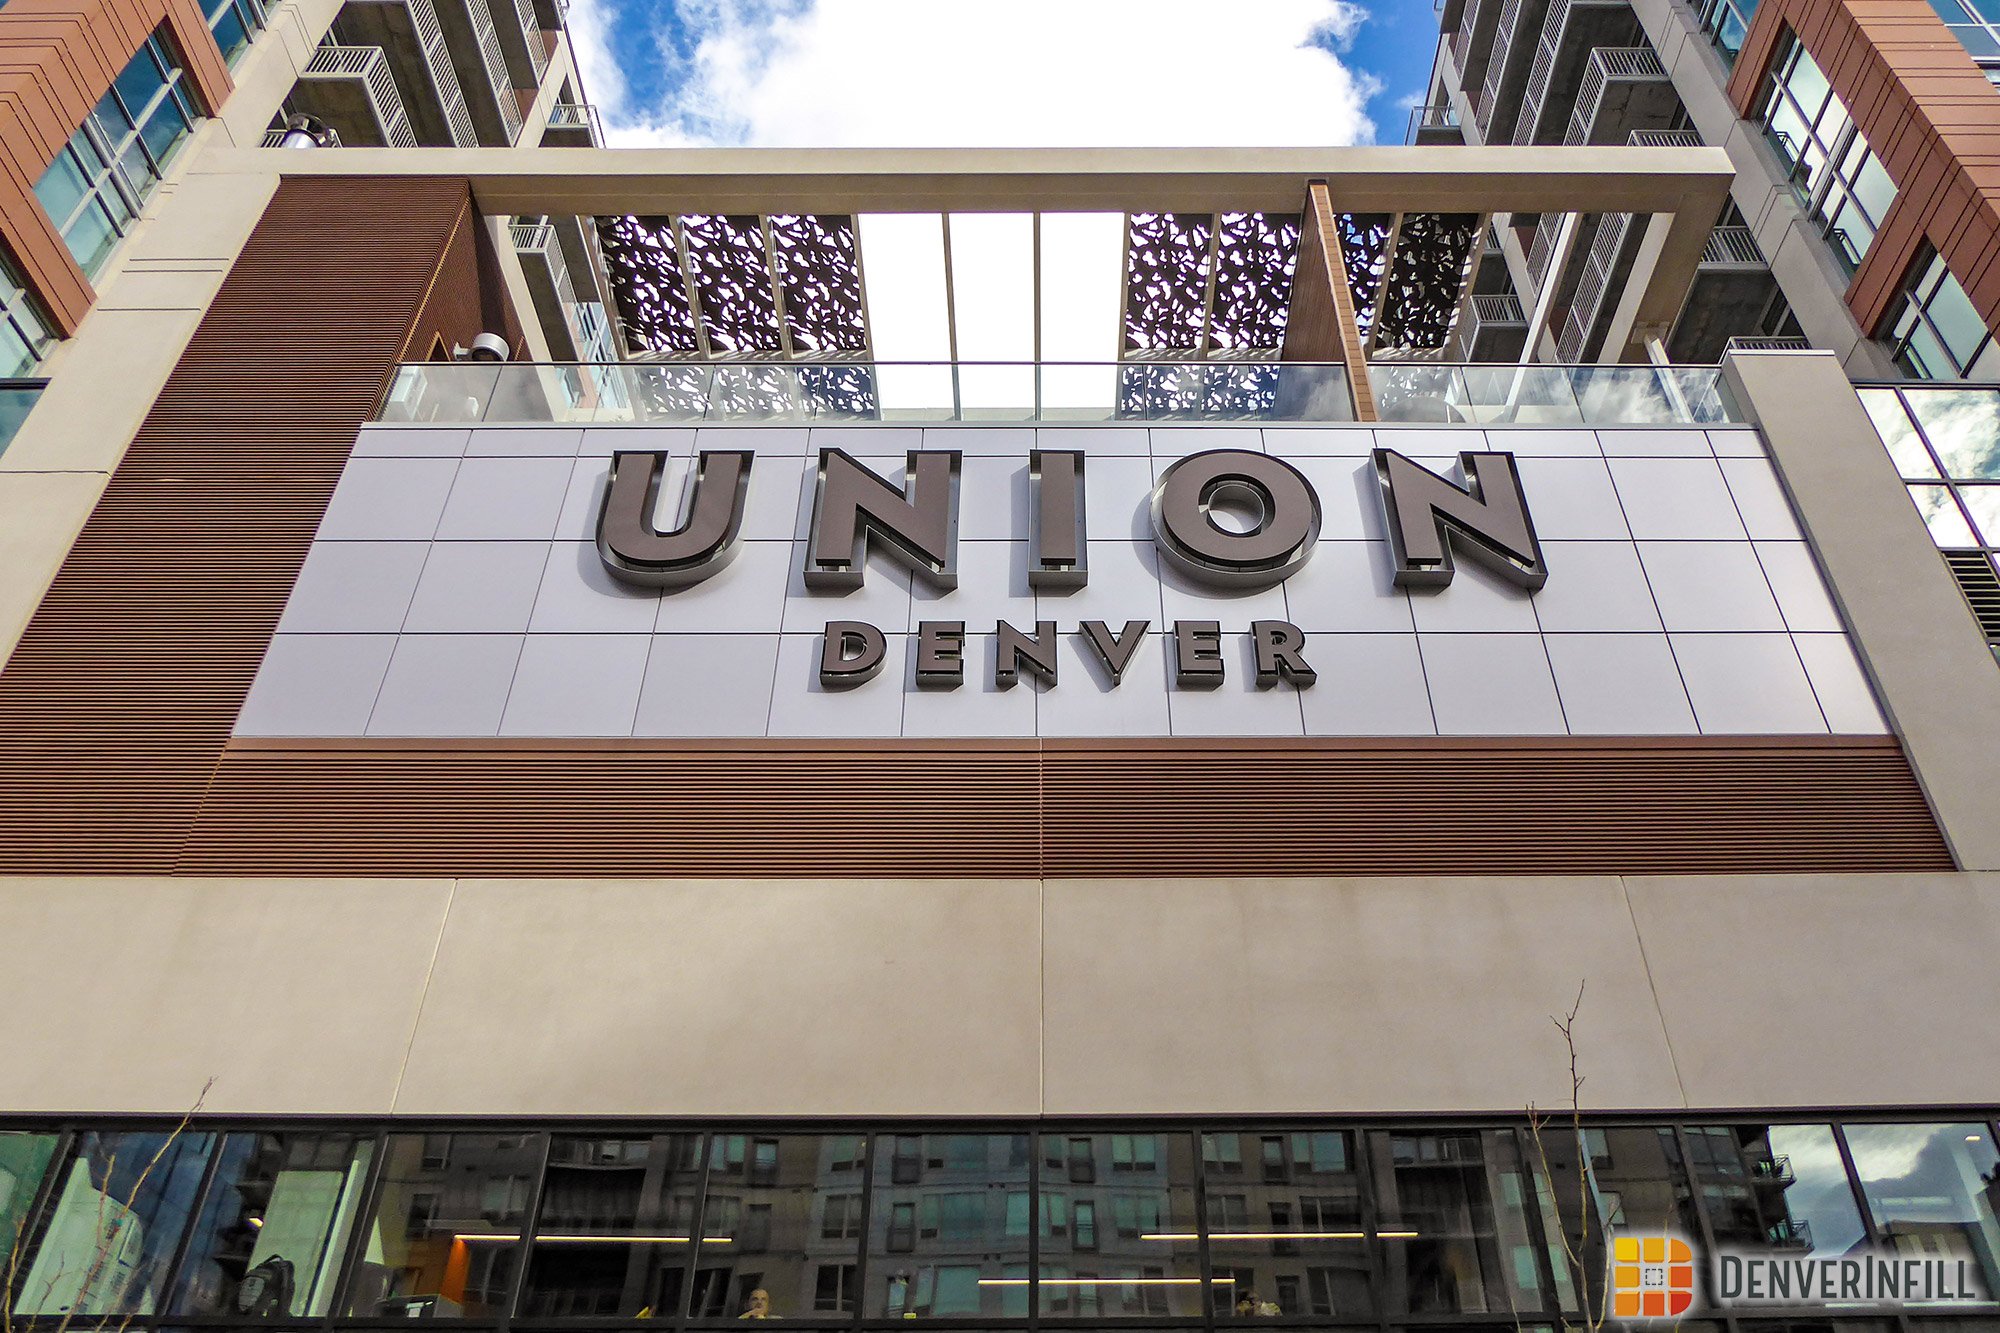 Union Denver was designed by Davis Partnership Architects